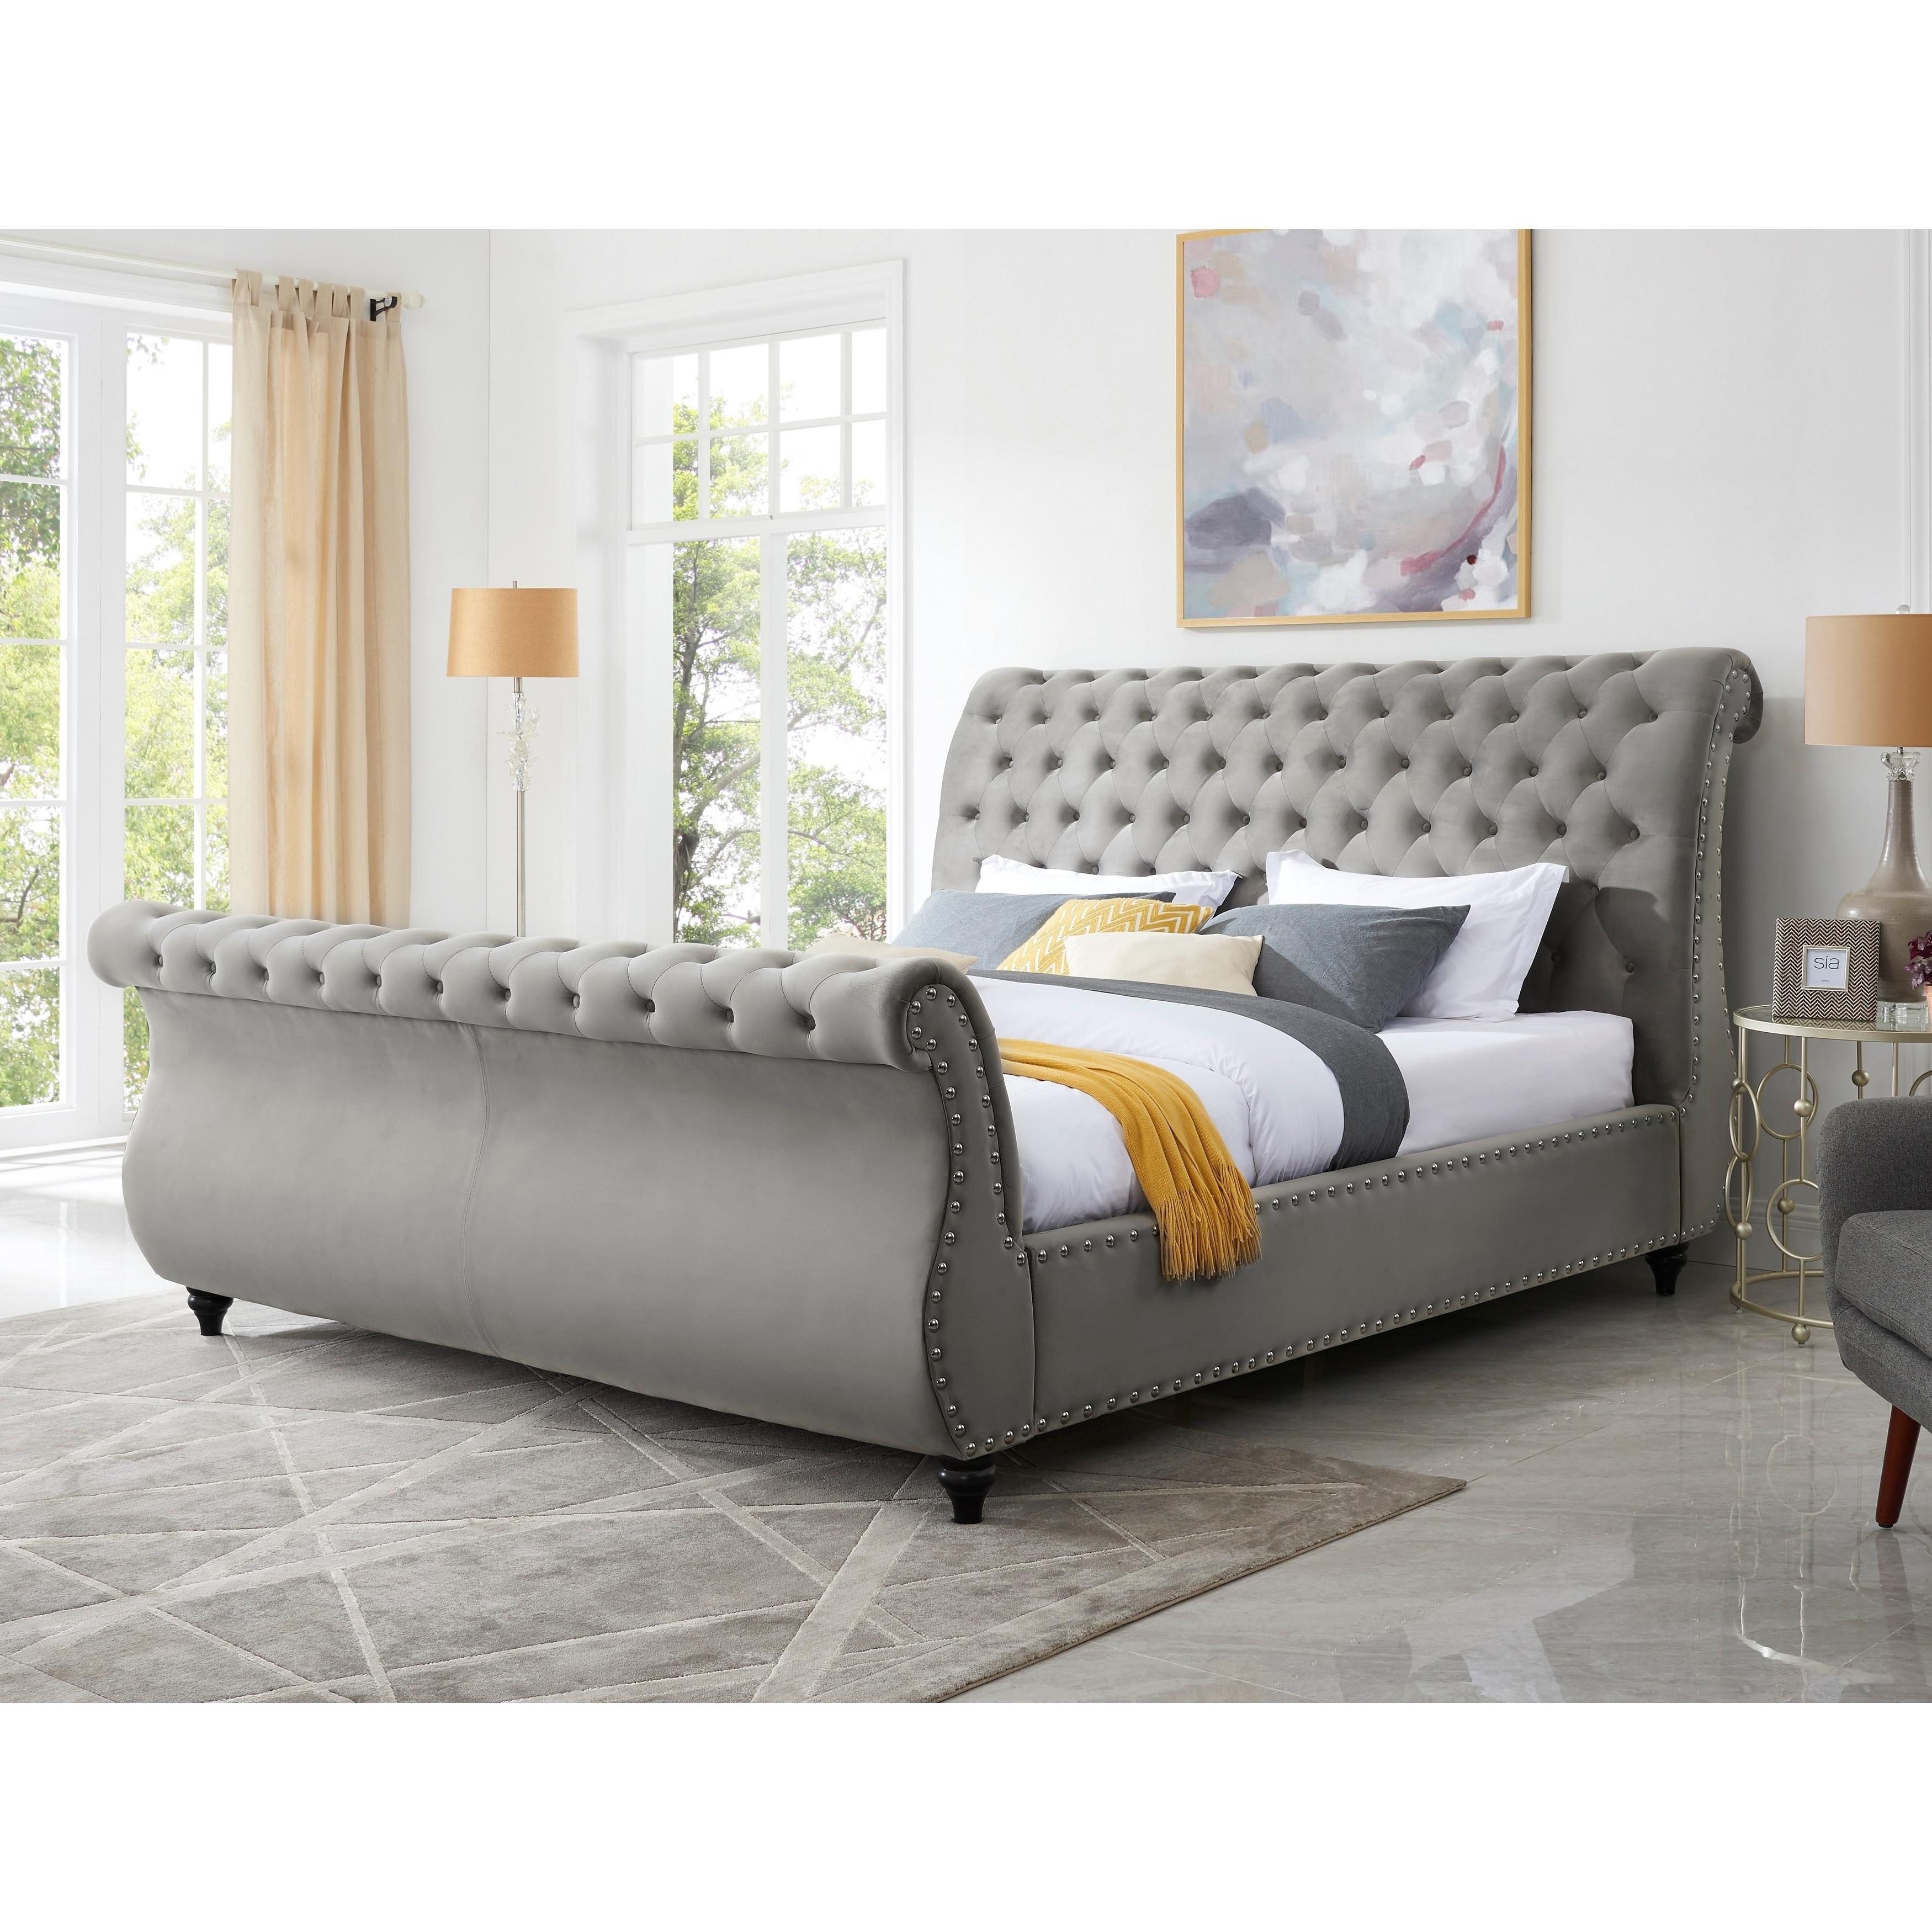 Shop Black Friday Deals On Evora Gray Velvet Upholstered Button Tufted Sleigh Bed Overstock 28234766 Queen